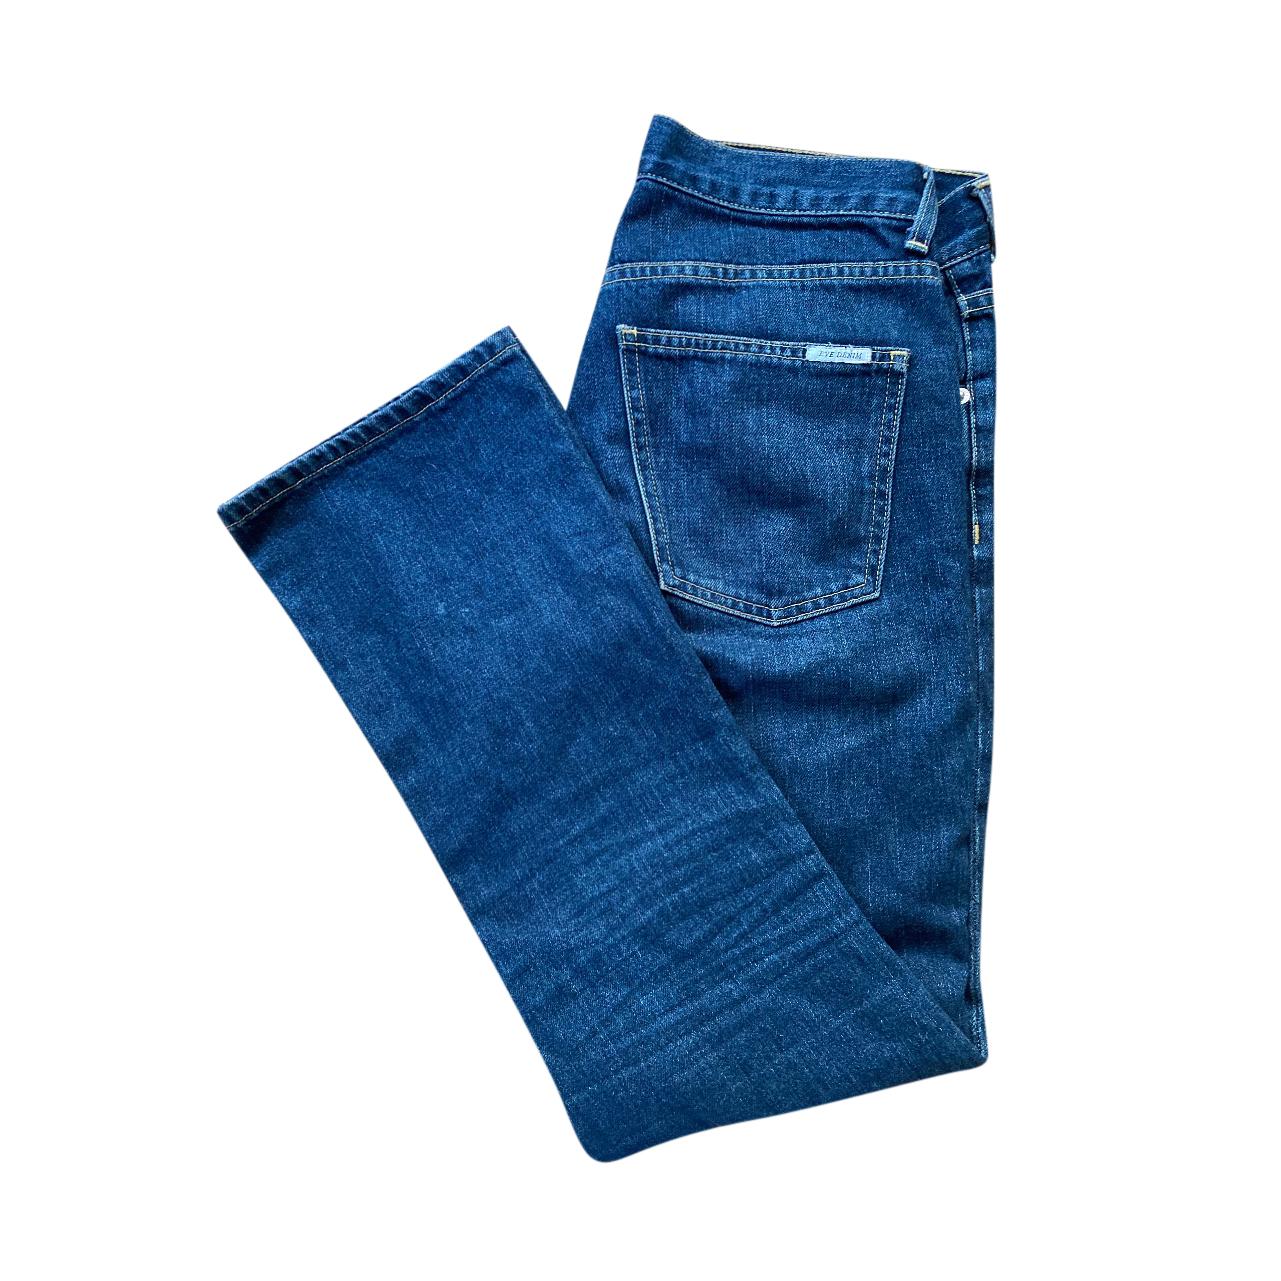 Eve Denim Justine Flared Jeans